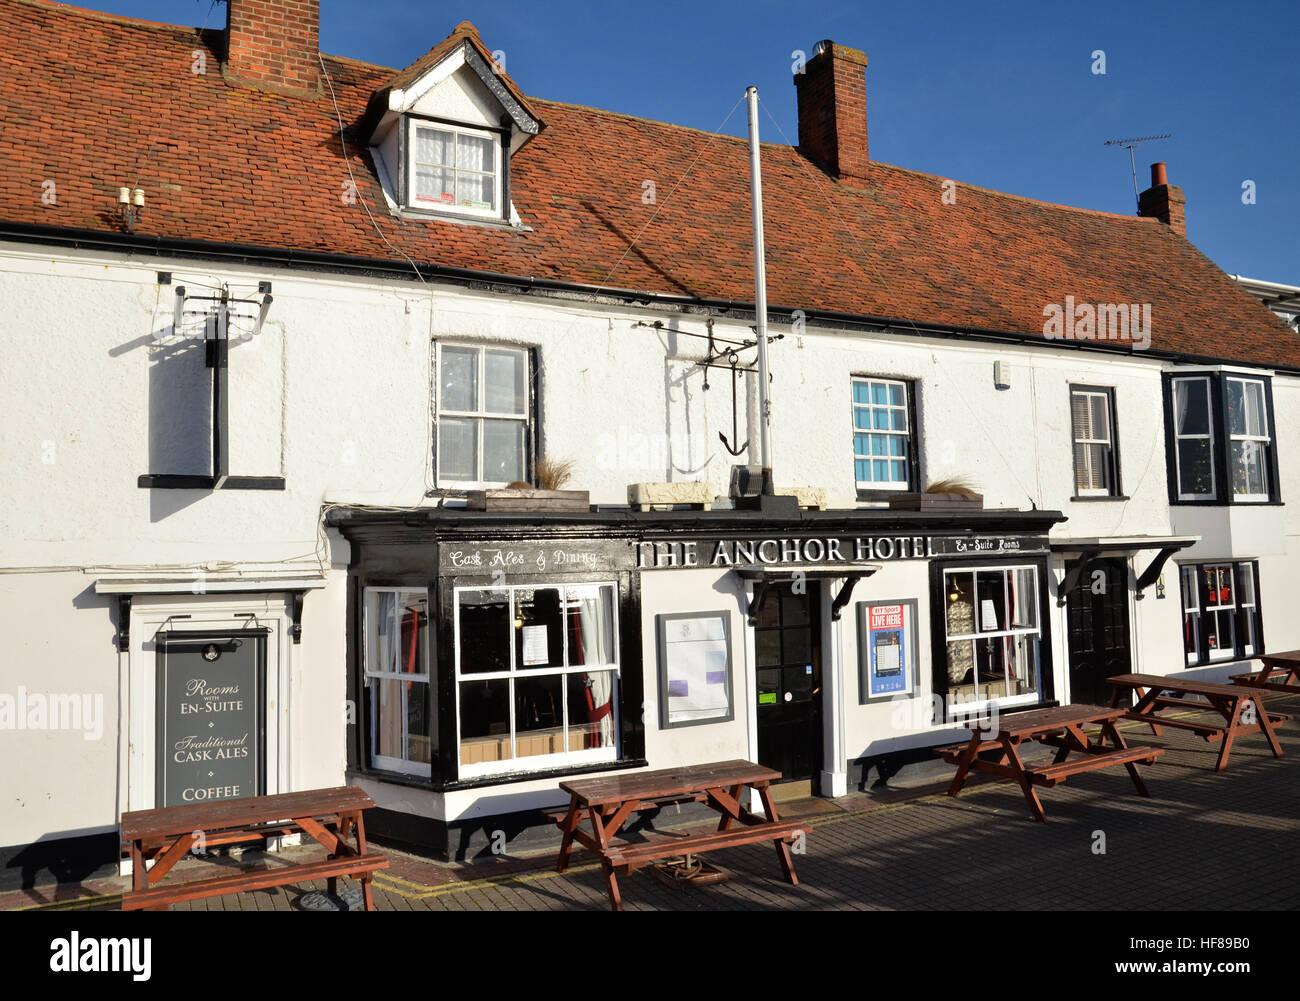 El Hotel Anchor en el Quayside en Burnham-on-Crouch en Essex Imagen De Stock